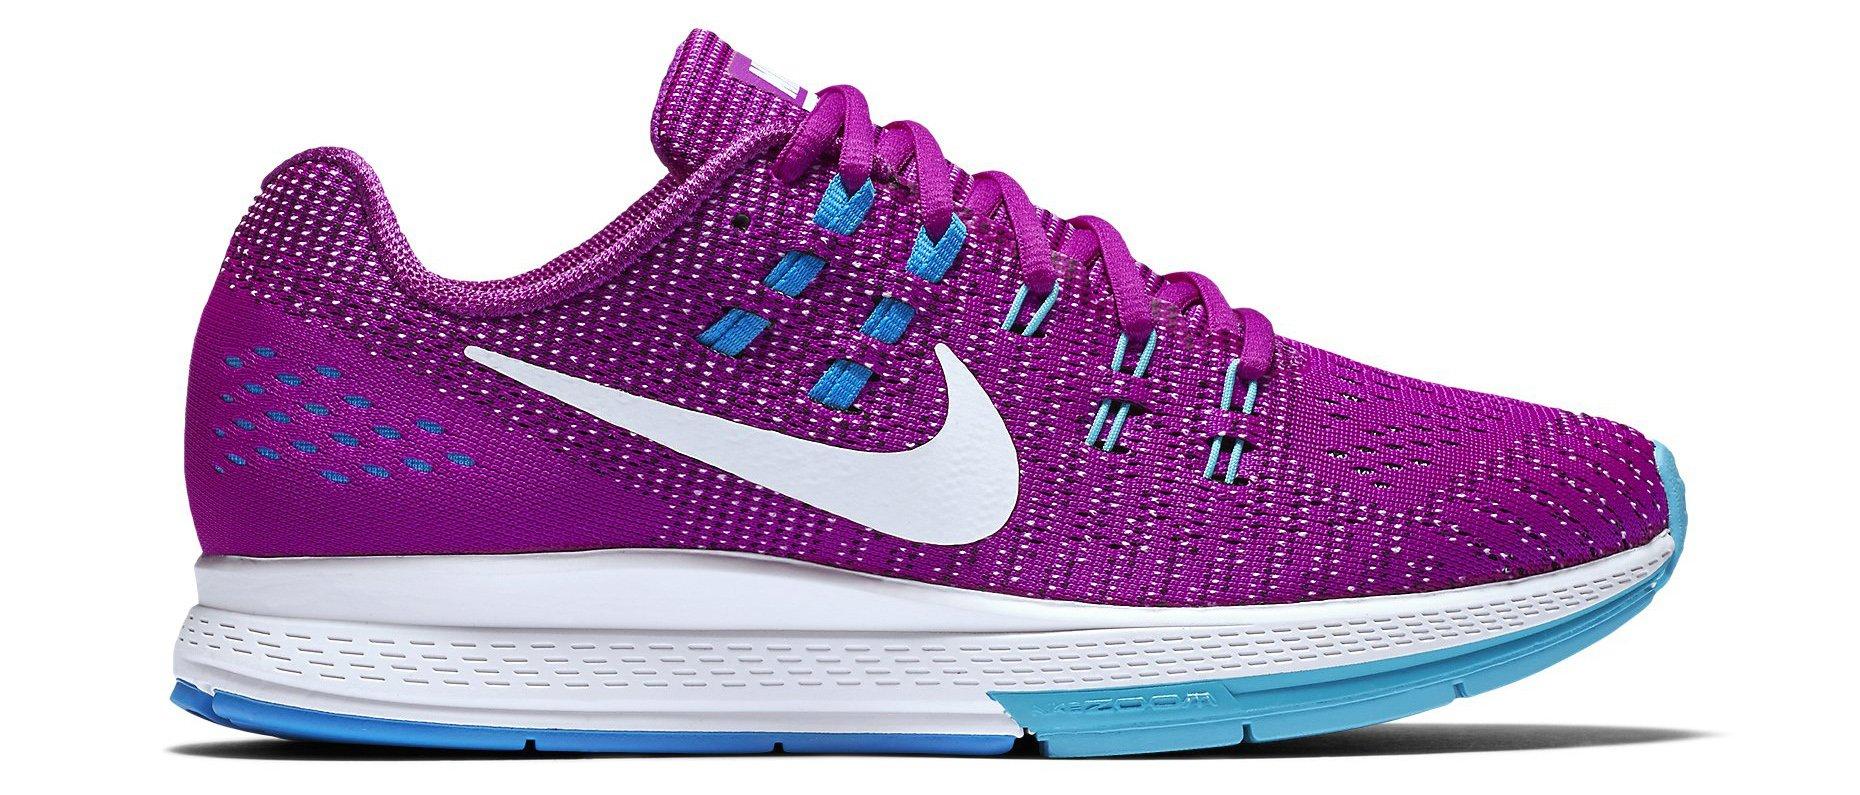 Běžecké boty Nike W AIR ZOOM STRUCTURE 19